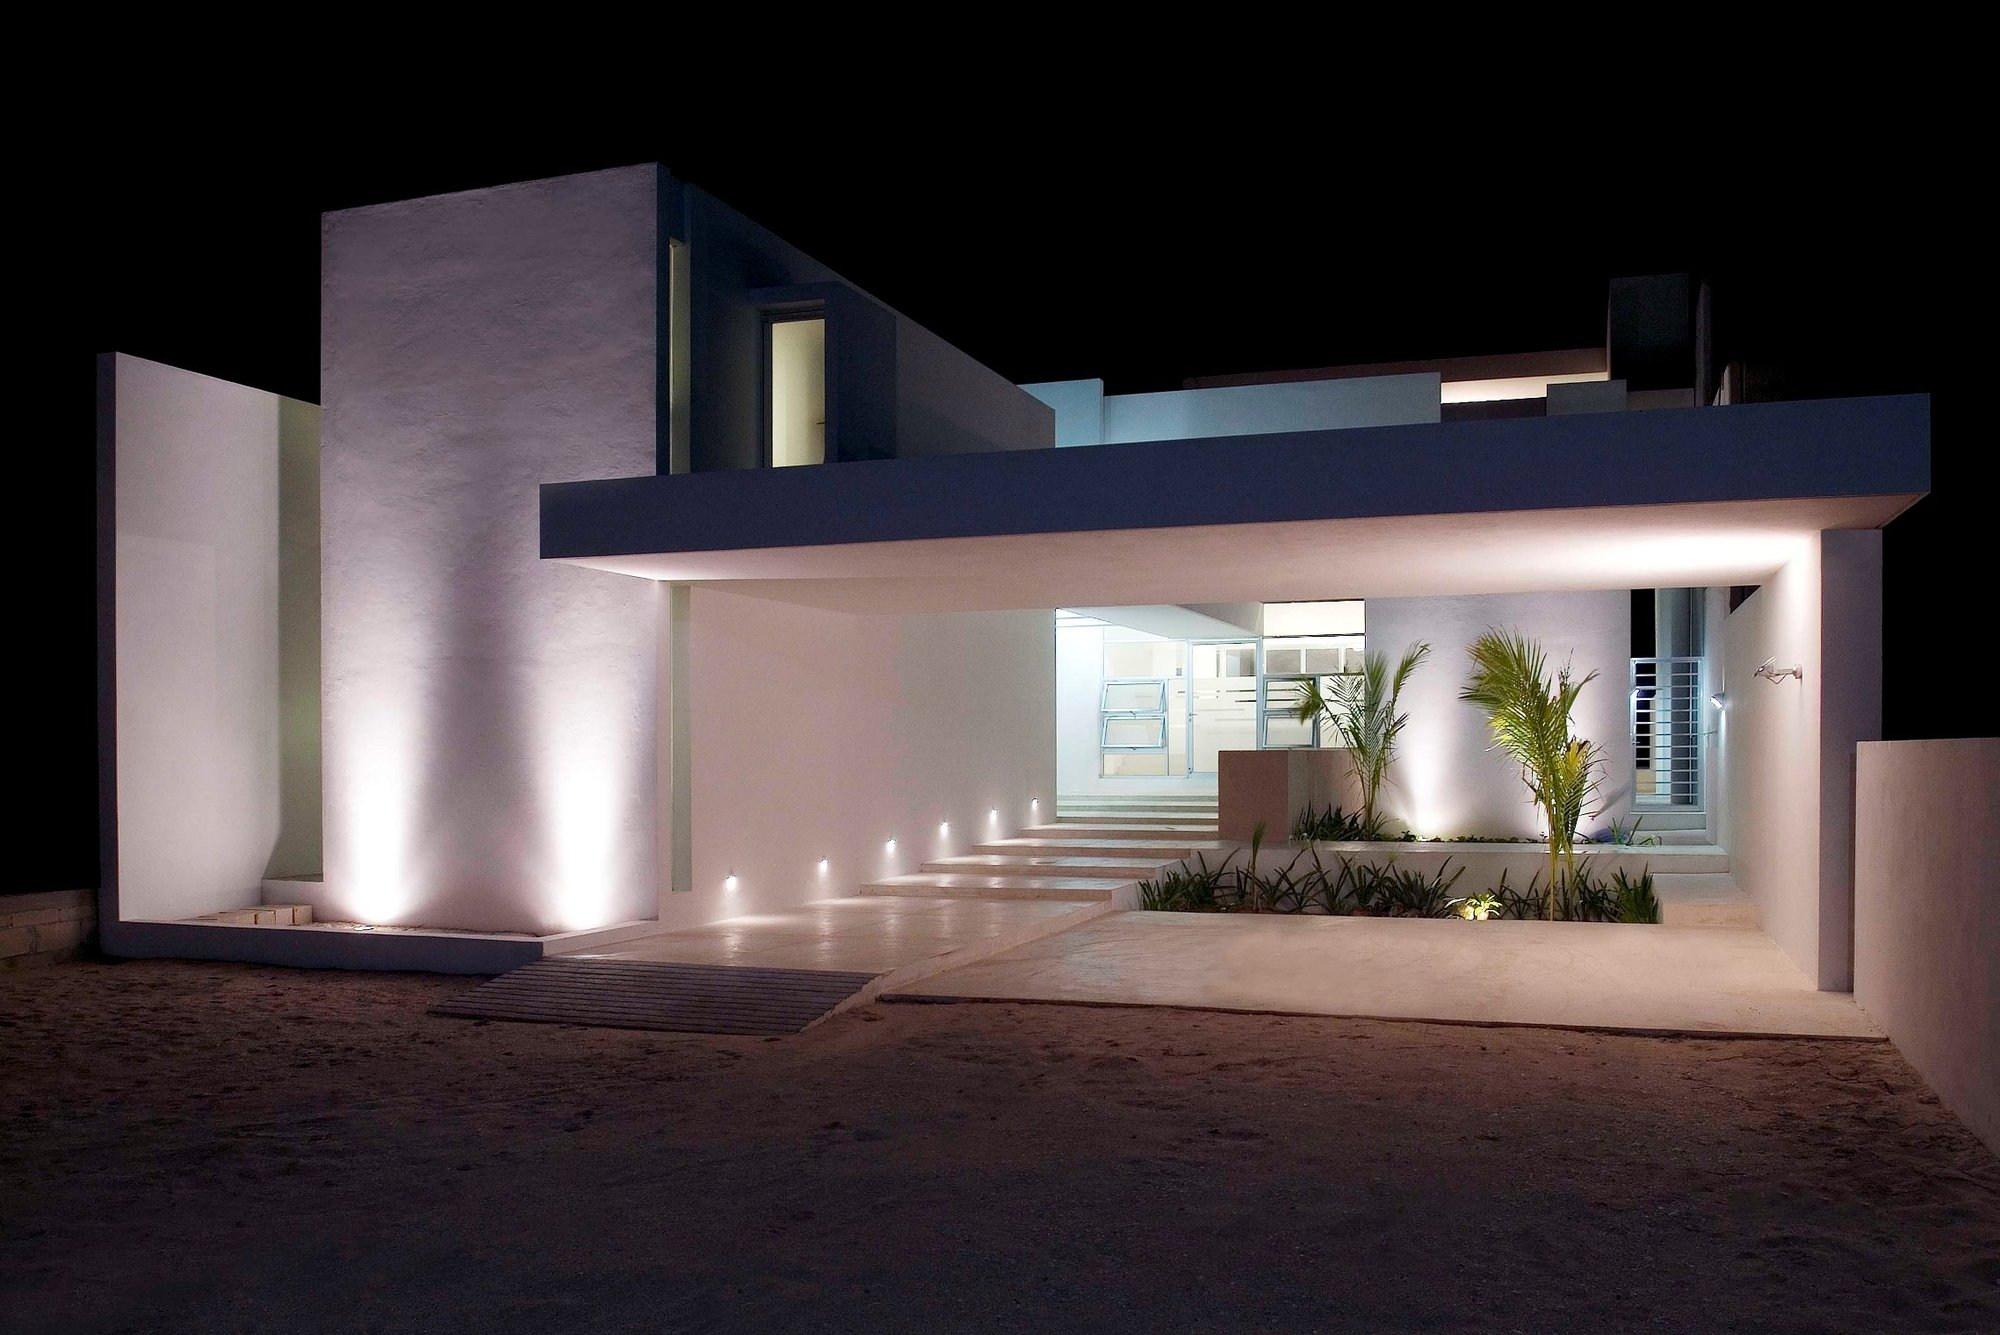 Stepped house by seijo peon arquitectos karmatrendz - Casa de iluminacion ...